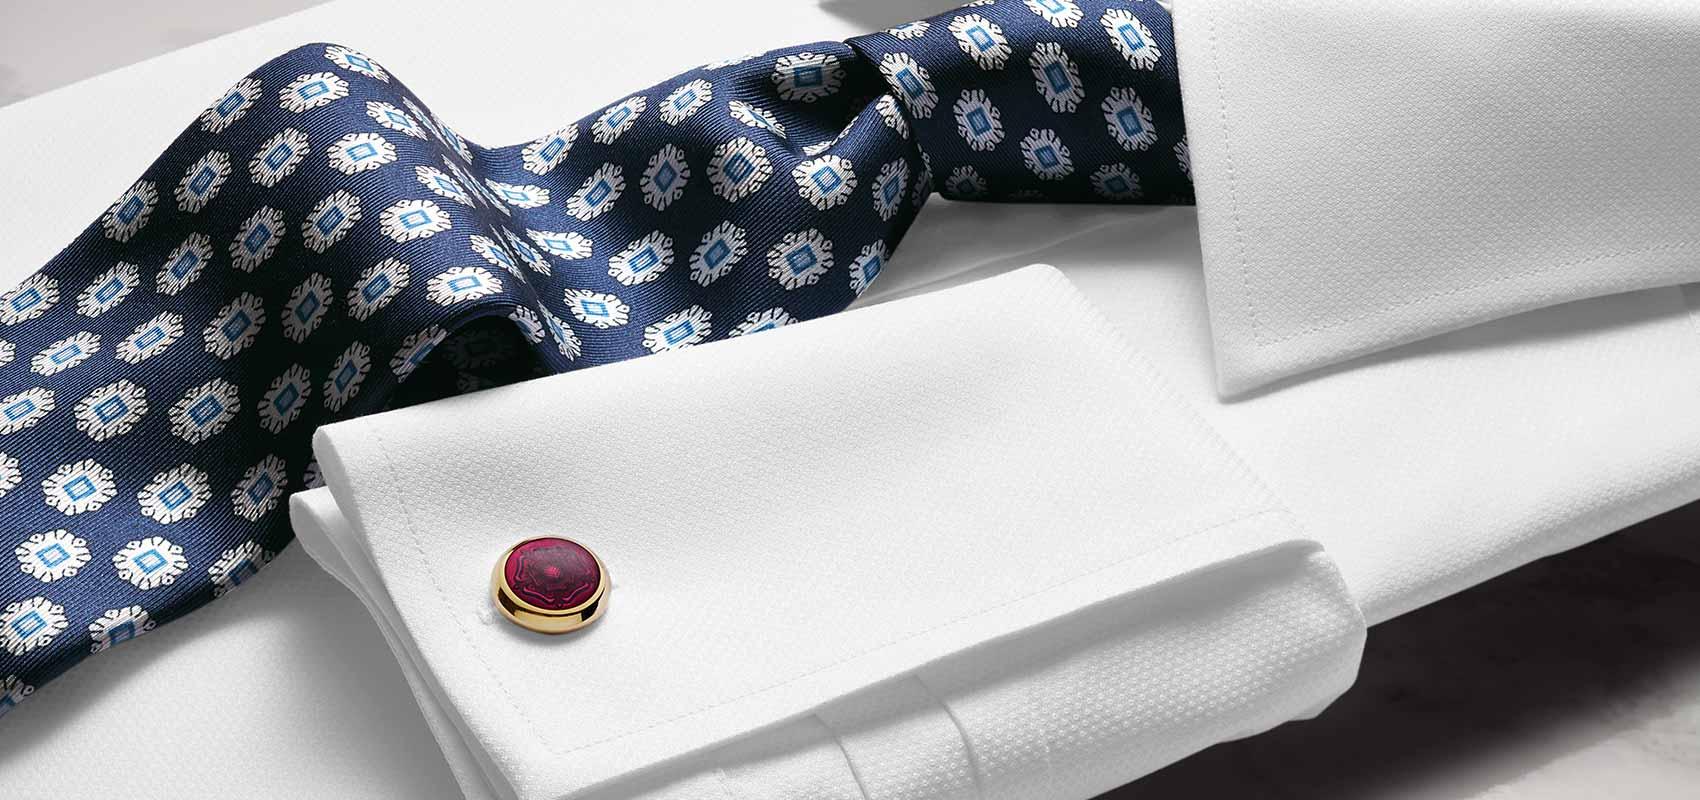 Charles Tyrwhitt Eygptian cotton oxford shirts